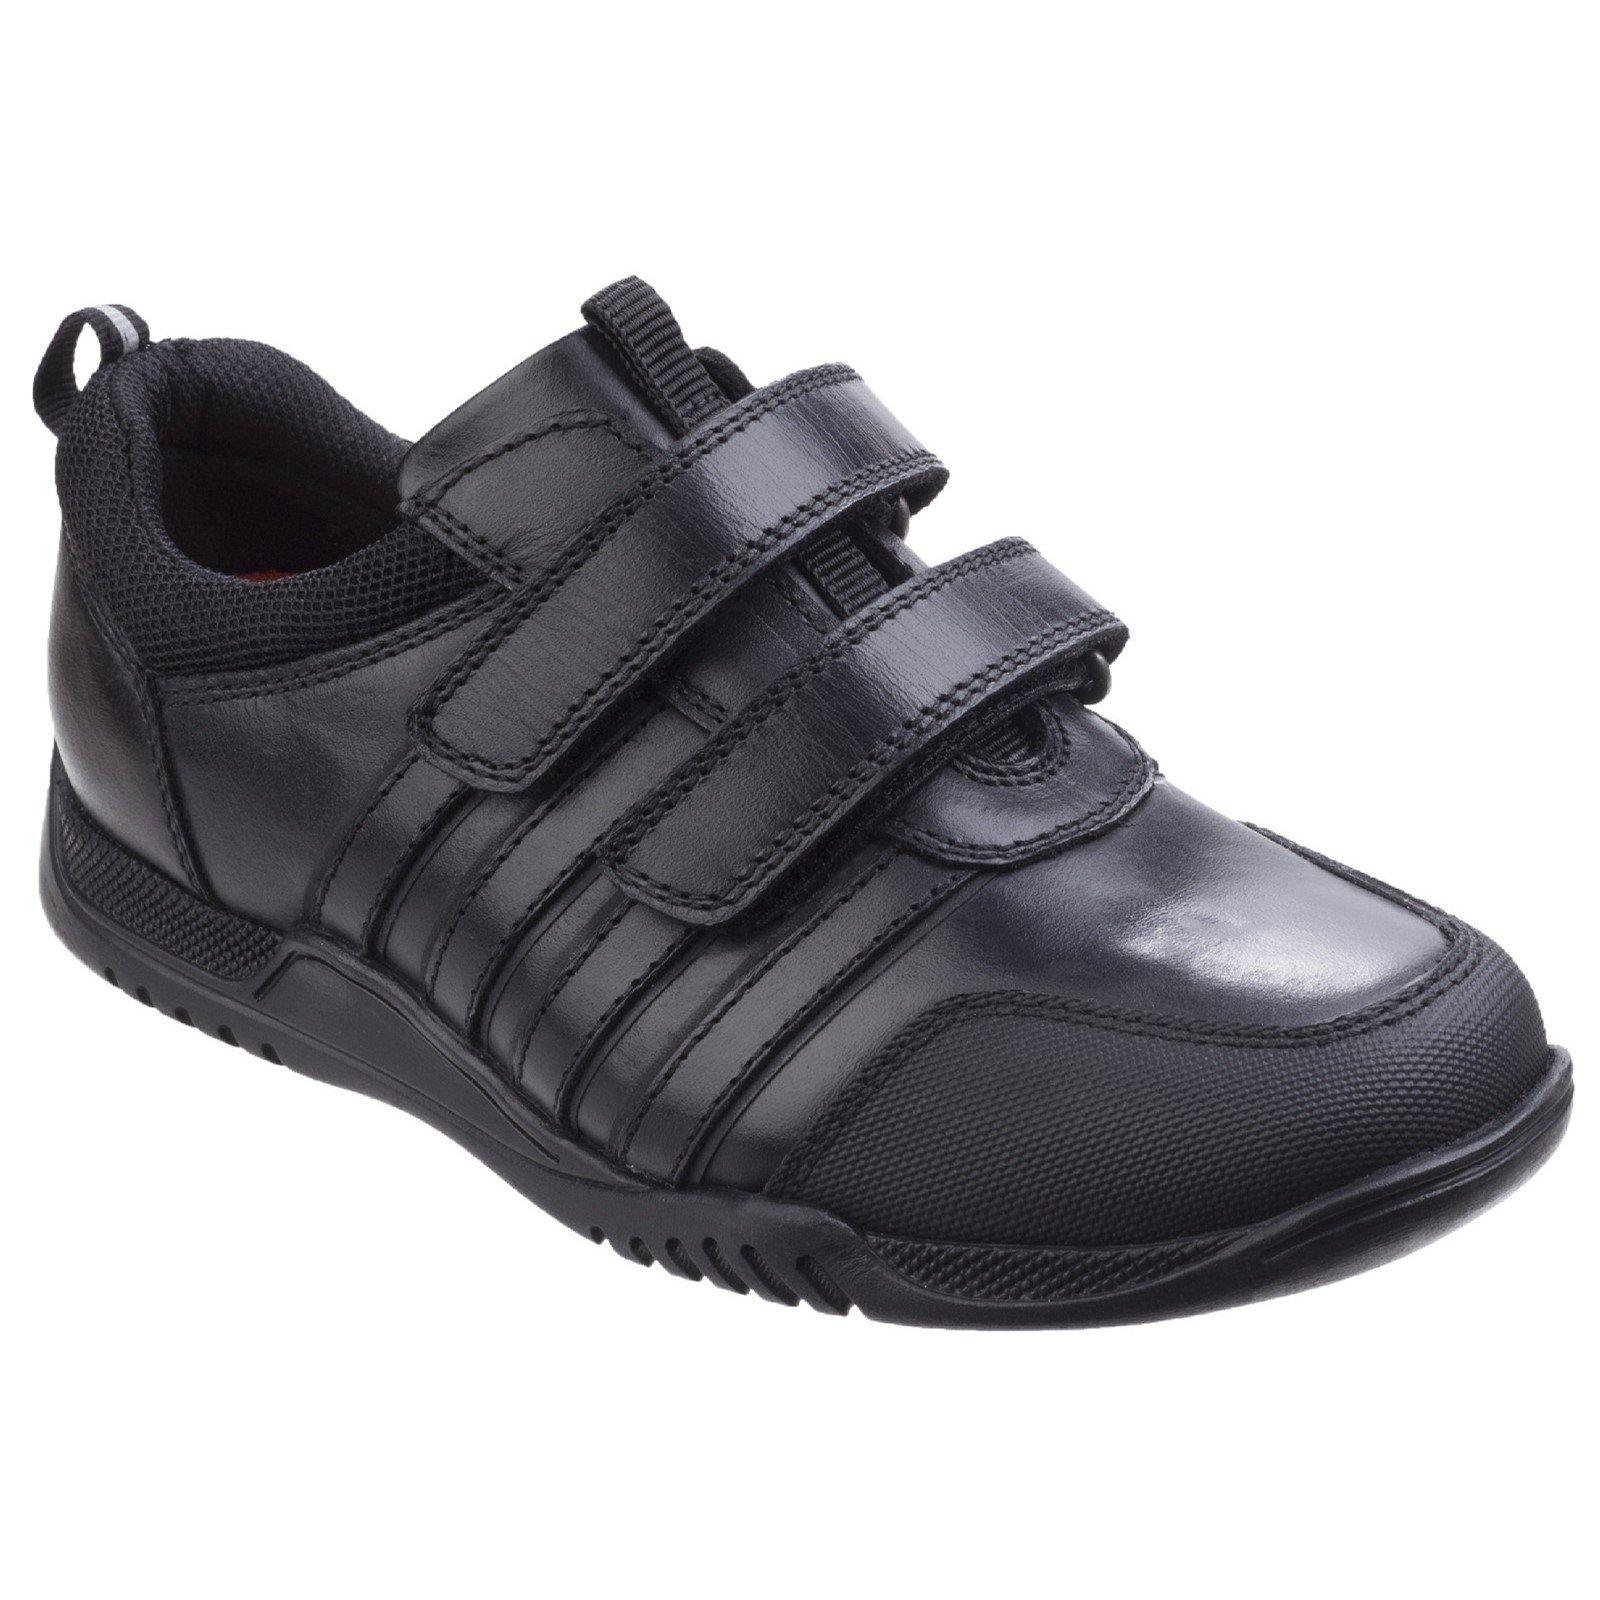 Hush Puppies Kid's Josh Senior School Shoe Black 26396 - Black 6